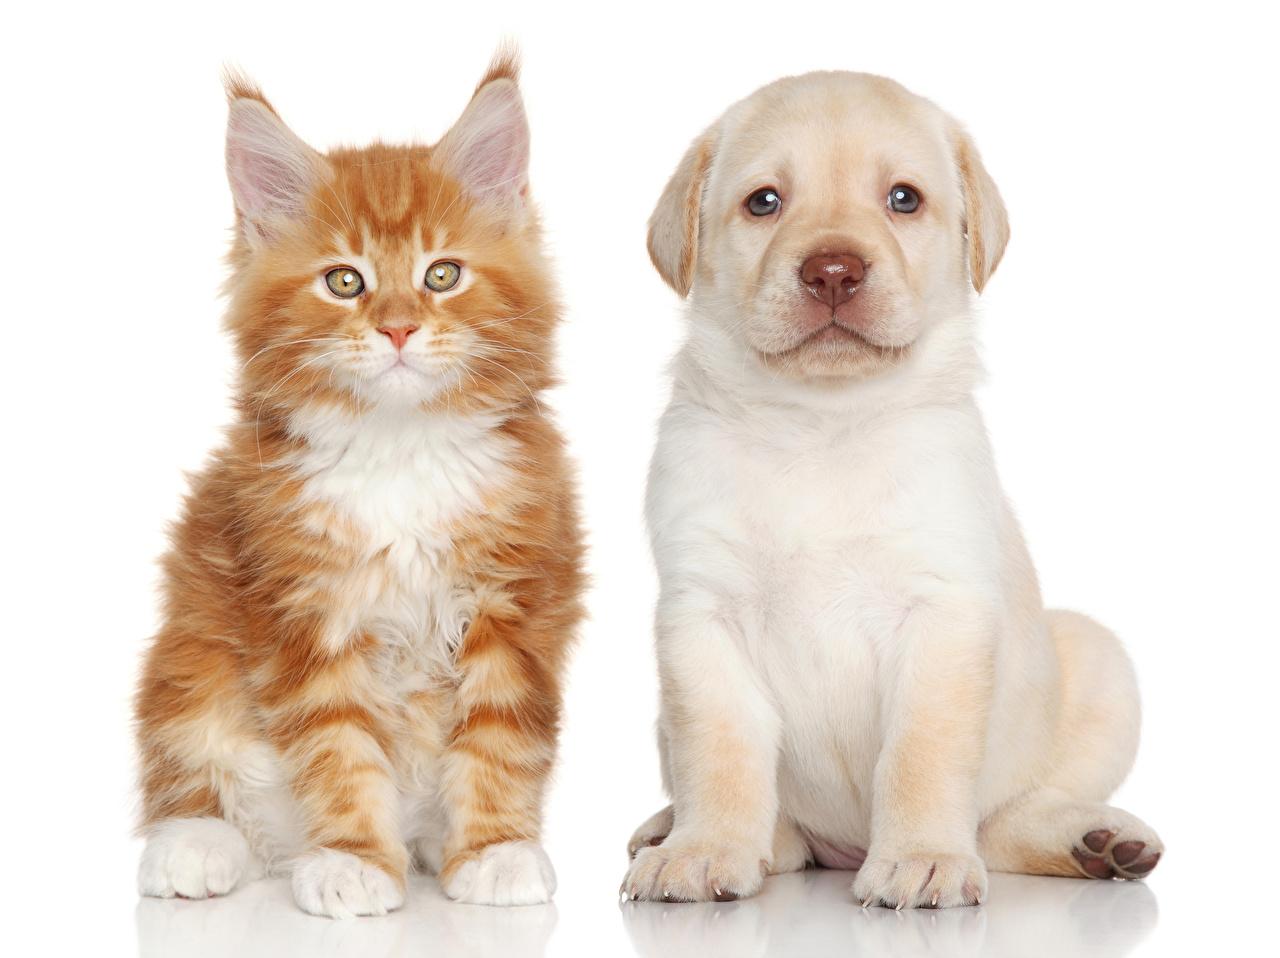 Bilder Valp Kattunger Maine Coon Labrador retriever Hunder Katter To 2 Dyr Hvit bakgrunn valper hund tamhund tamkatt huskatt